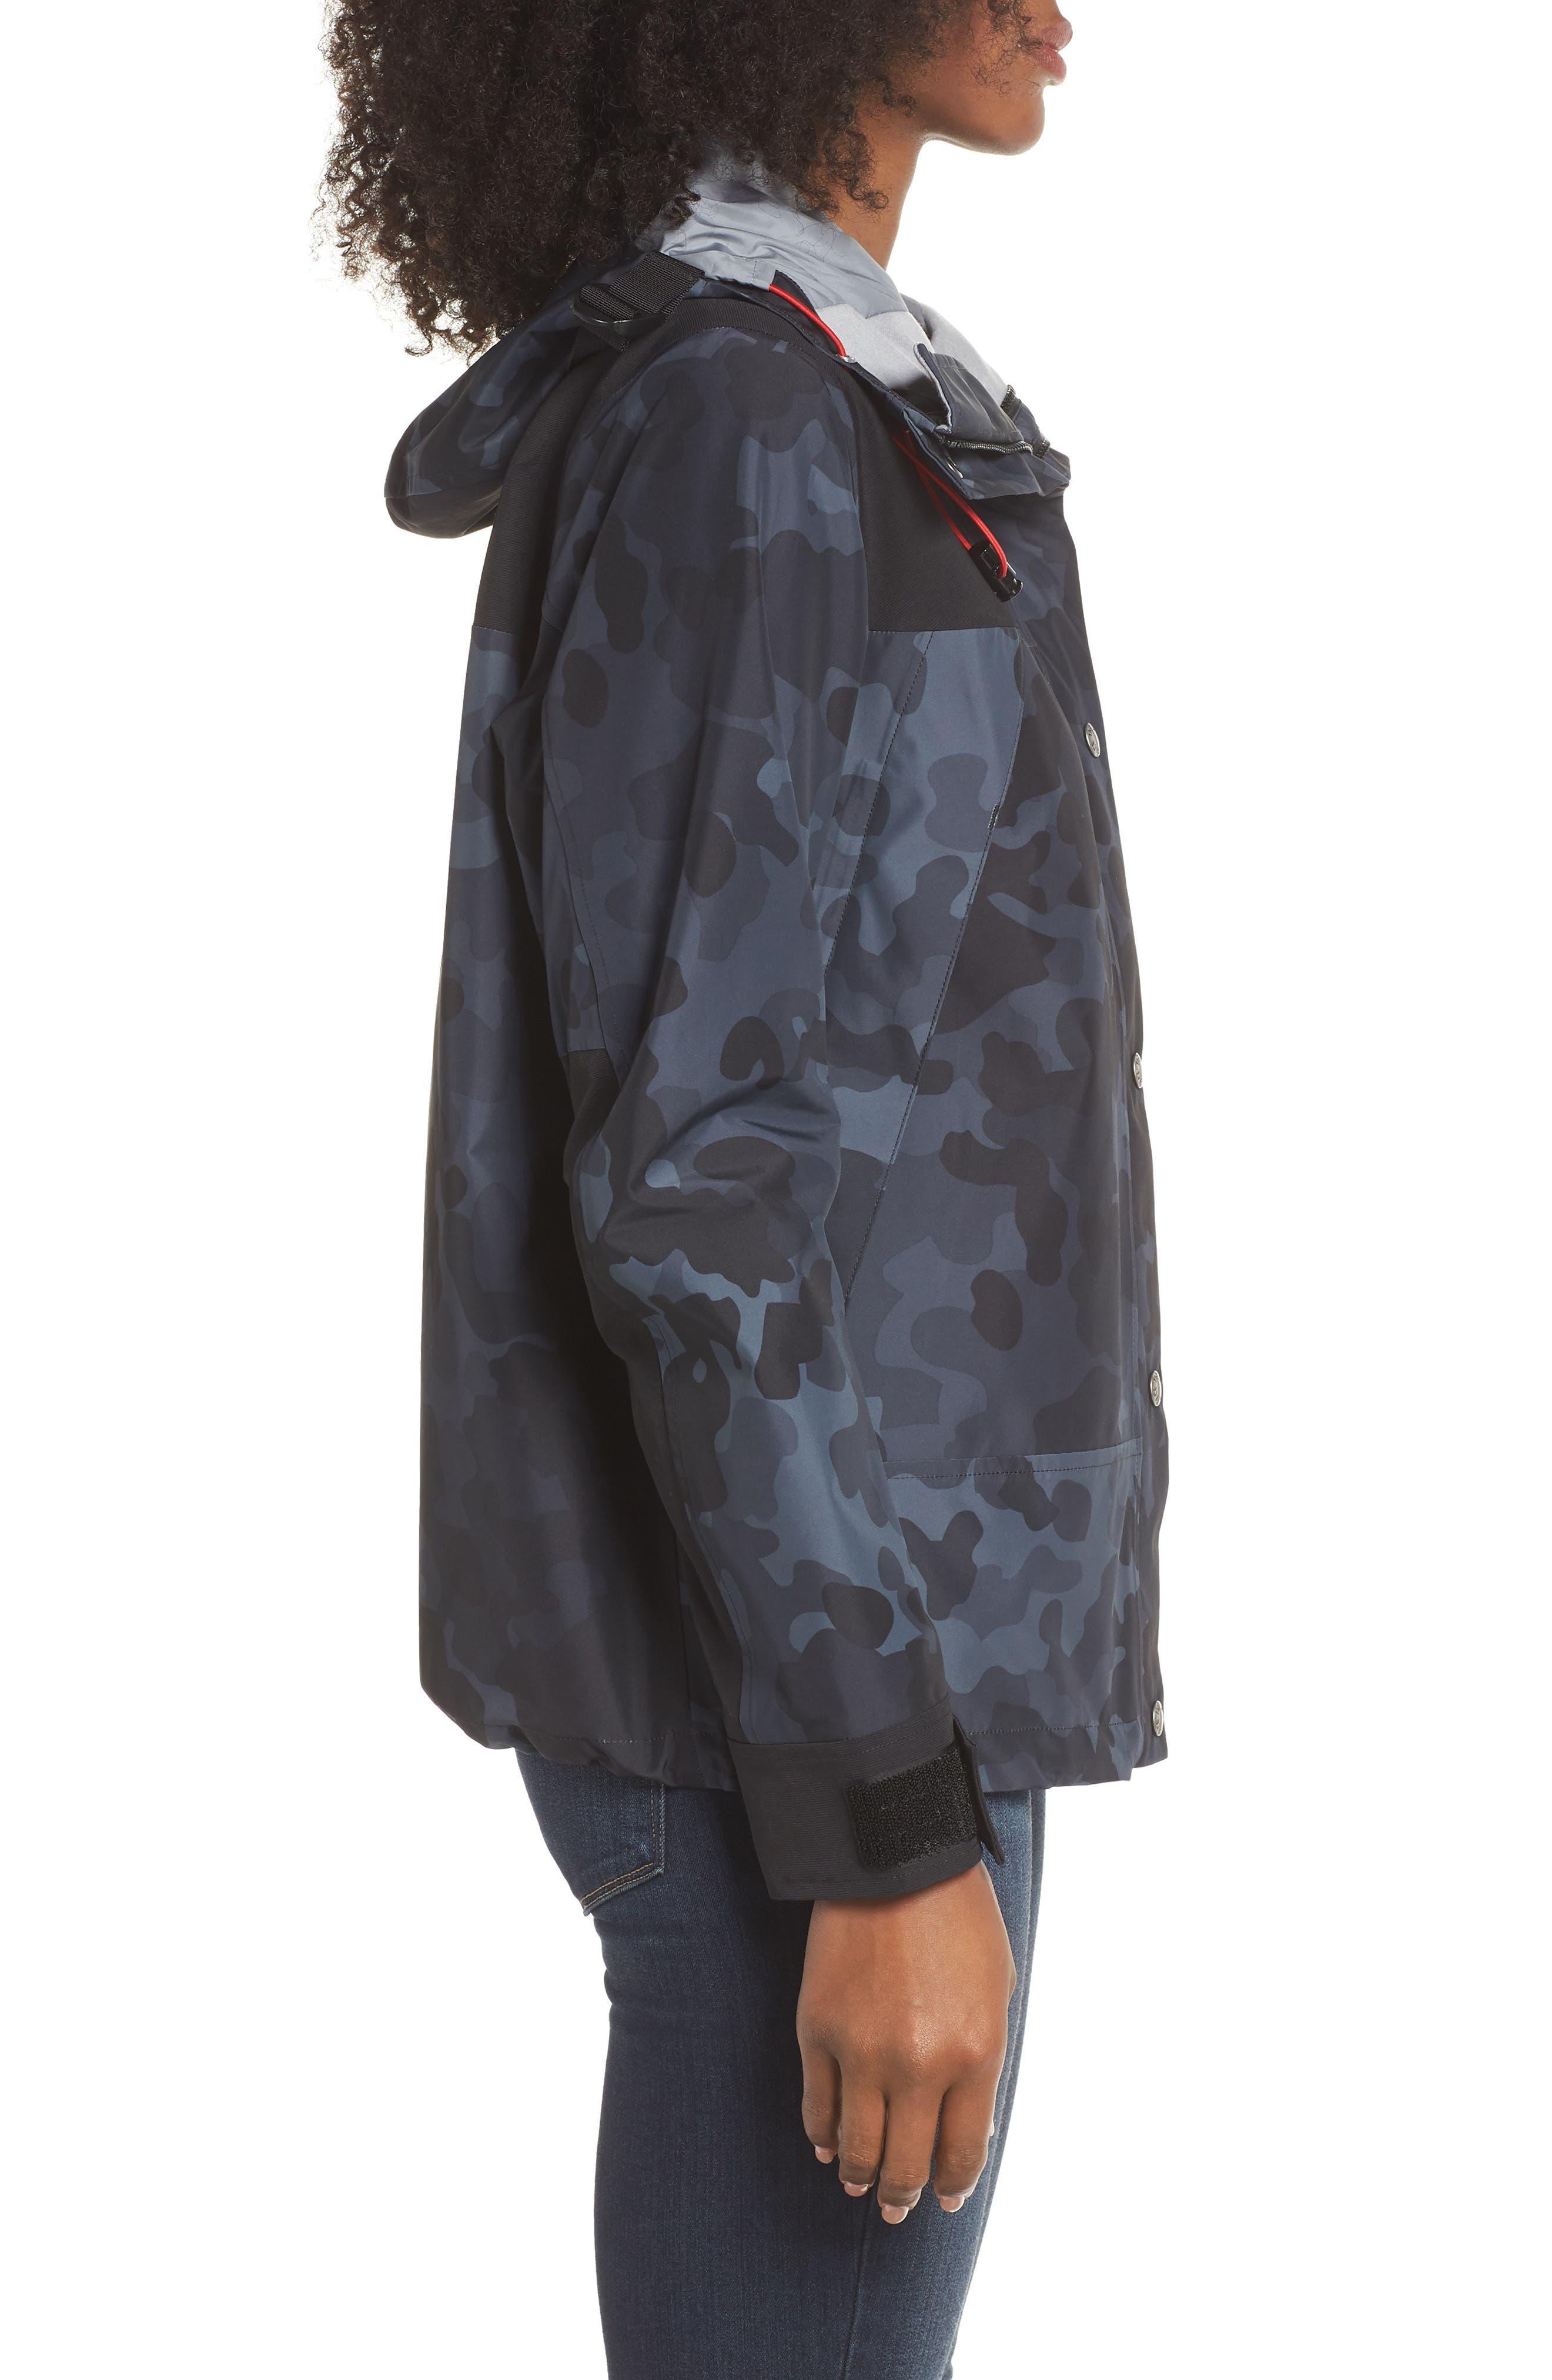 1990 Mountain Gore-Tex<sup>®</sup> Waterproof Jacket,                             Alternate thumbnail 3, color,                             TNF BLACK MACROFLECK PRINT